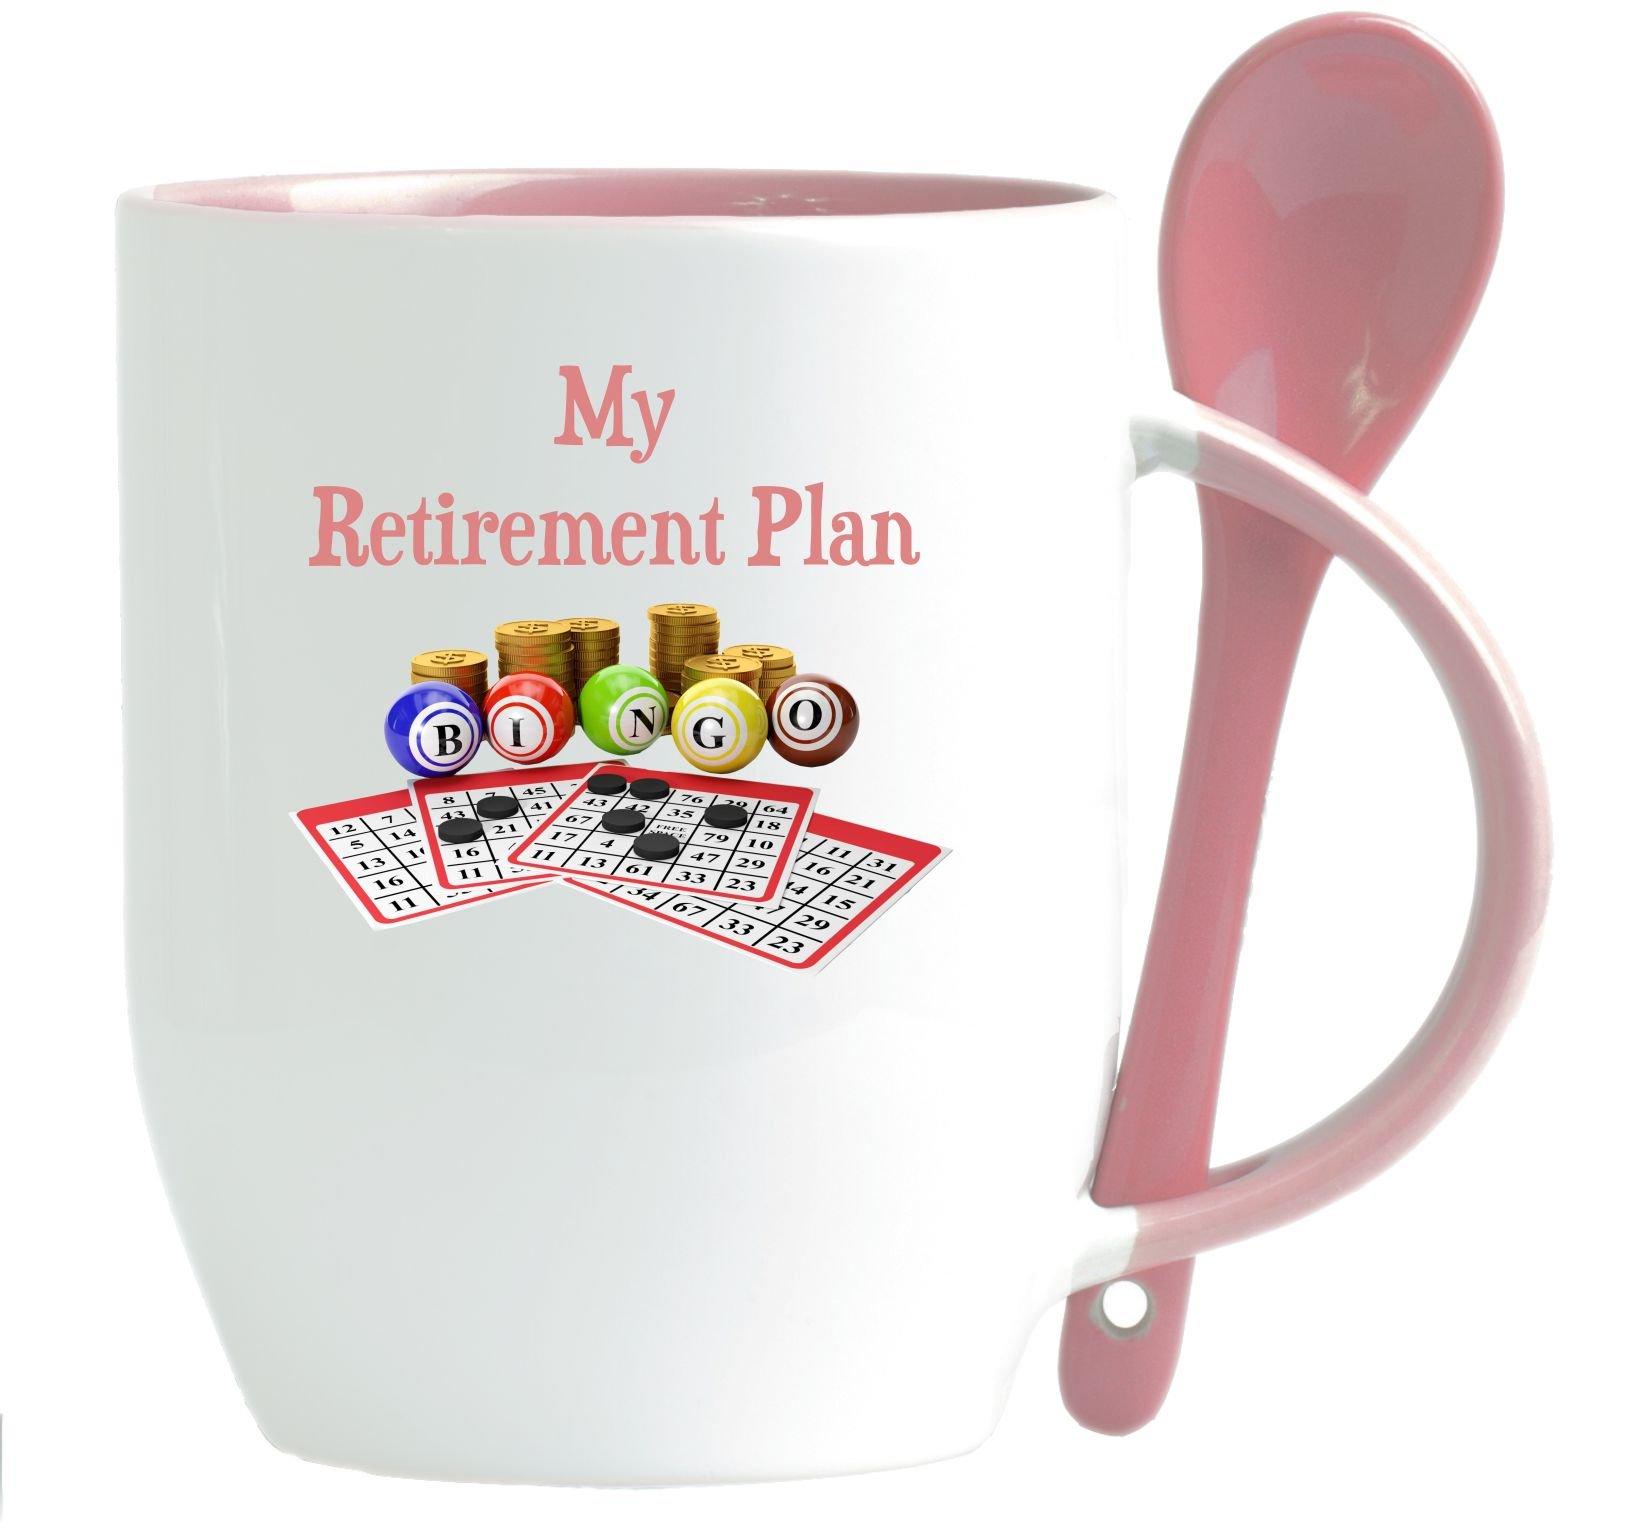 Rikki Knight My Retirement Plan is Bingo - Funny Quotes Design 12oz Ceramic Mug with matching Ceramic Spoon